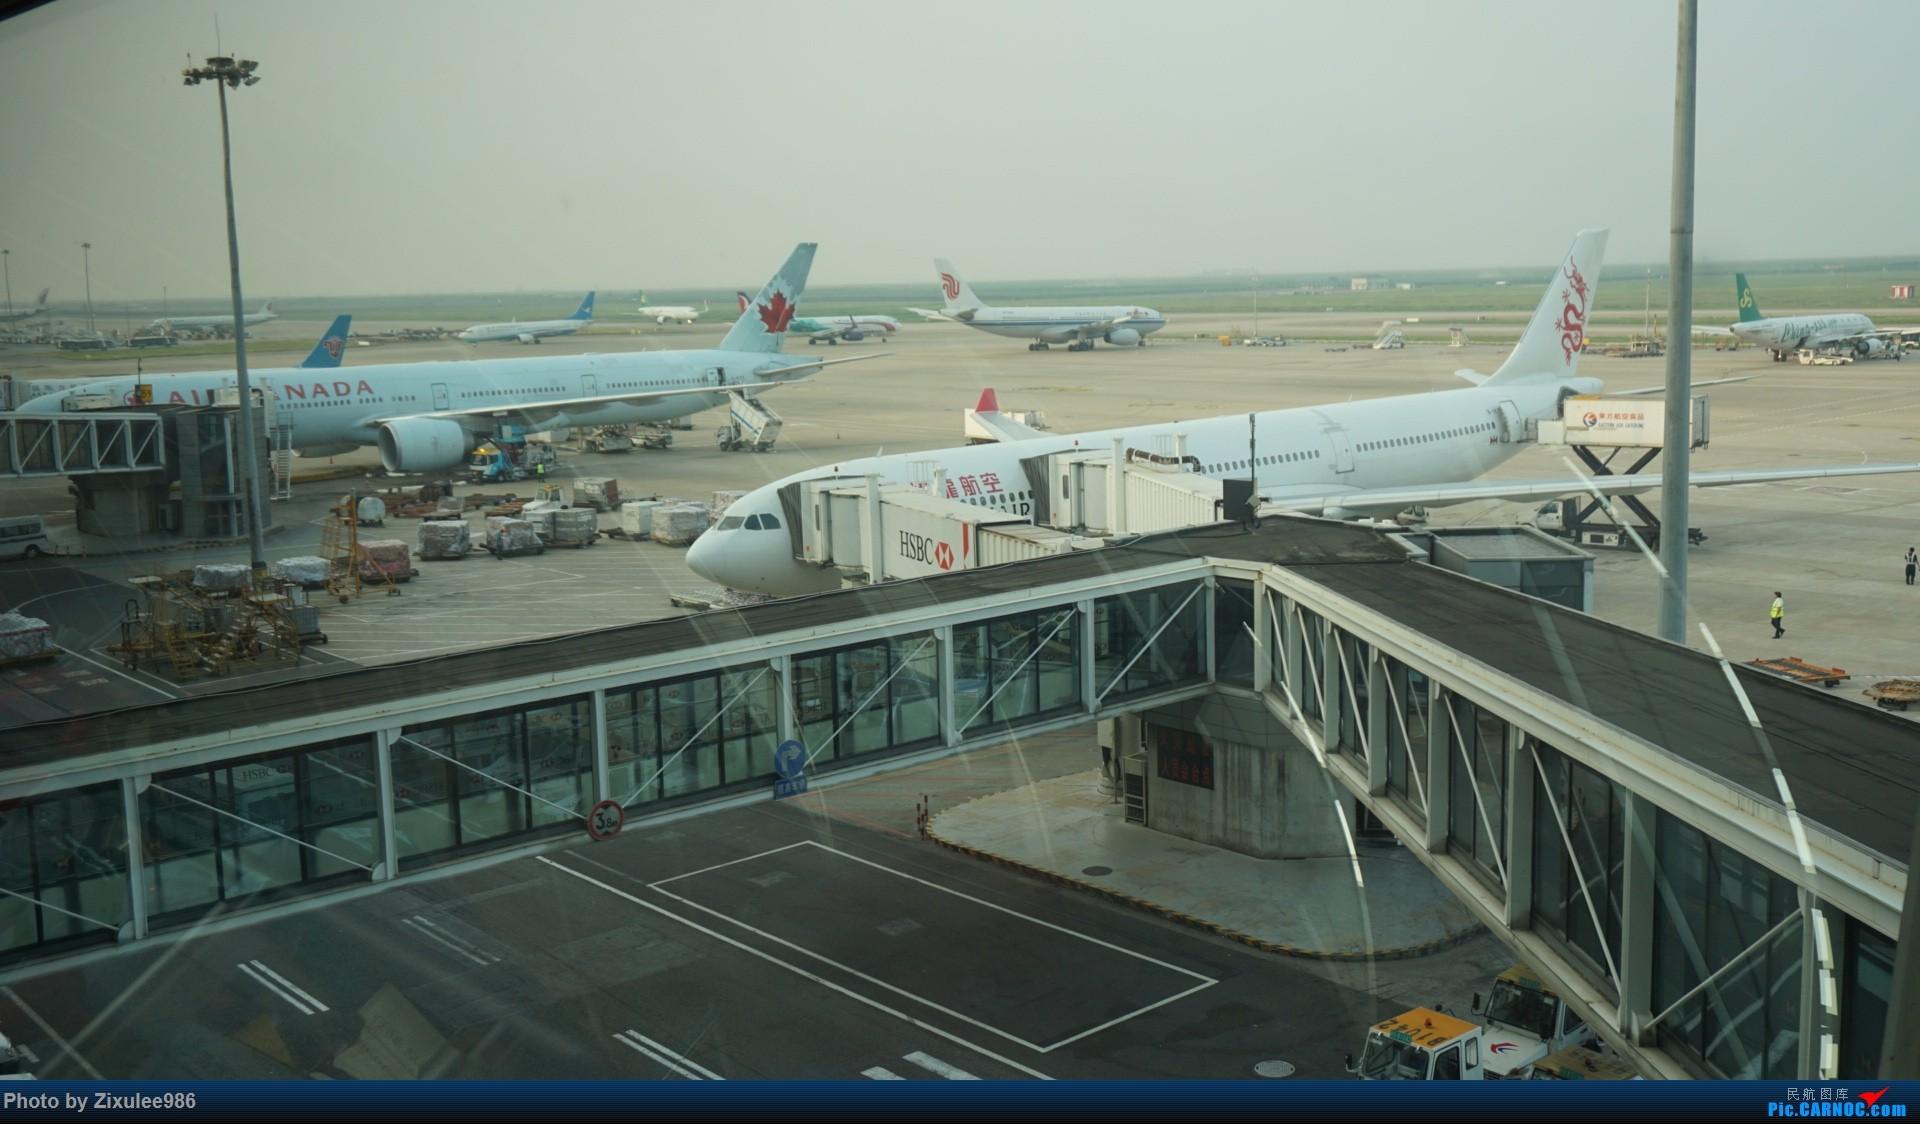 Re:[原创][一图党]加拿大新装B777-300ER 1920*1280 BOEING 777-333(ER) C-FITL 中国上海浦东国际机场